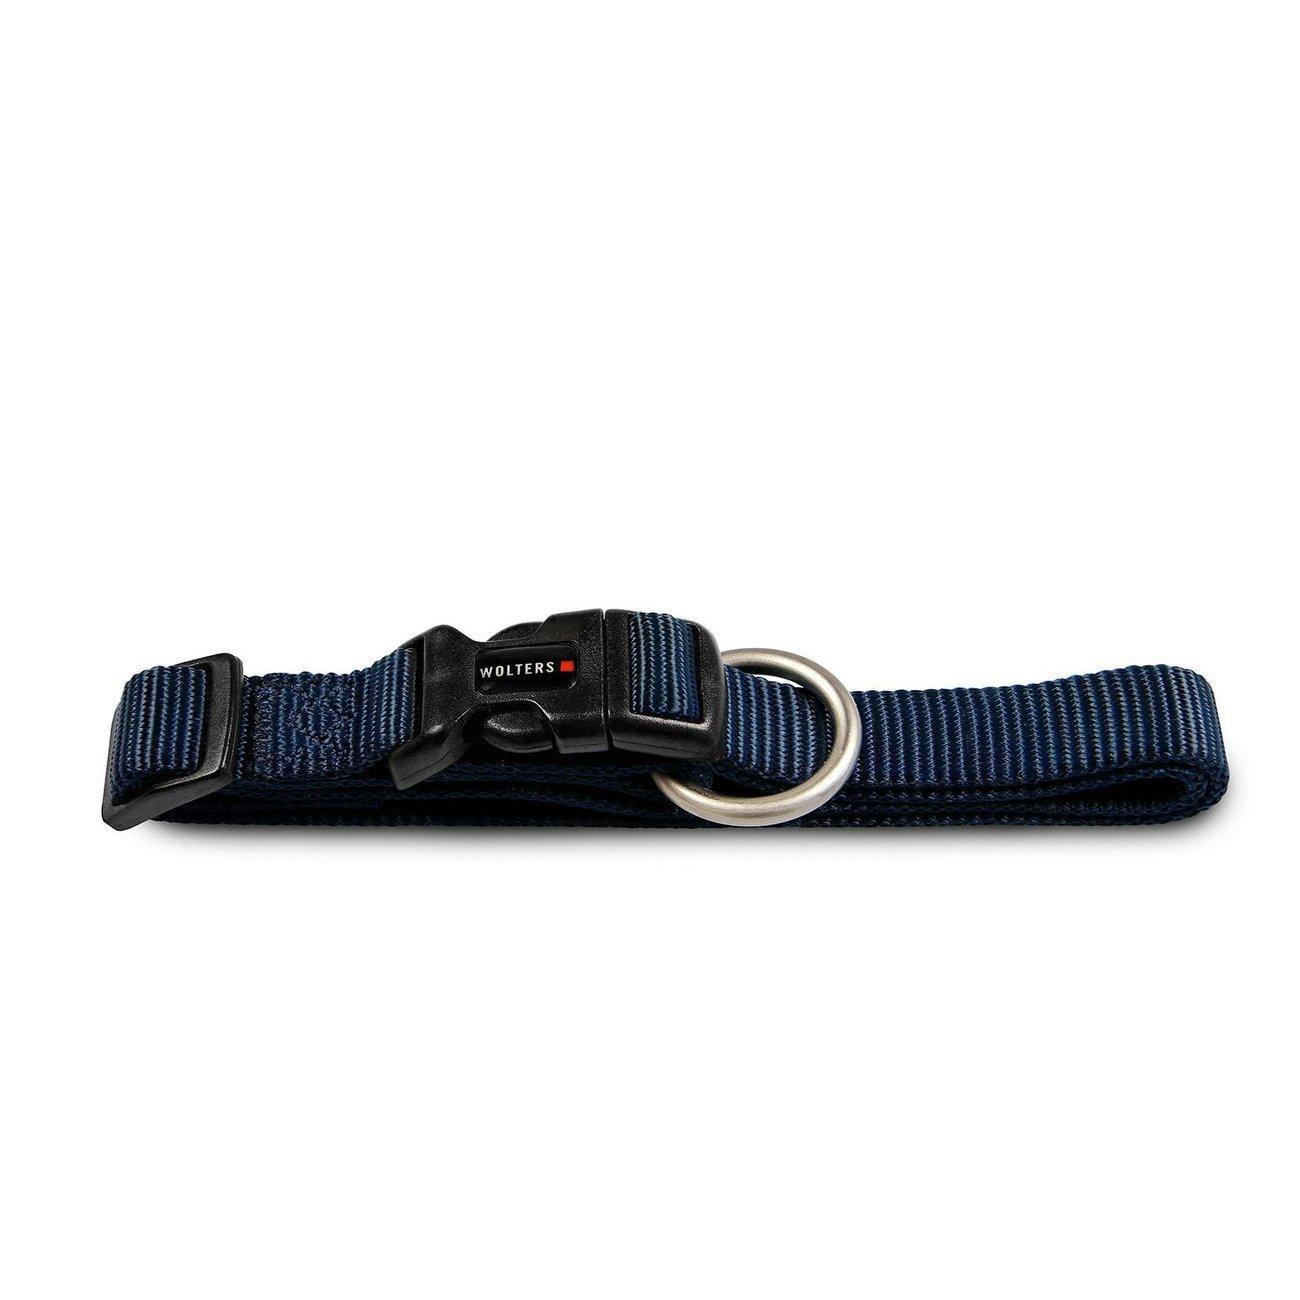 Wolters Halsband Nylon Professional, Bild 14